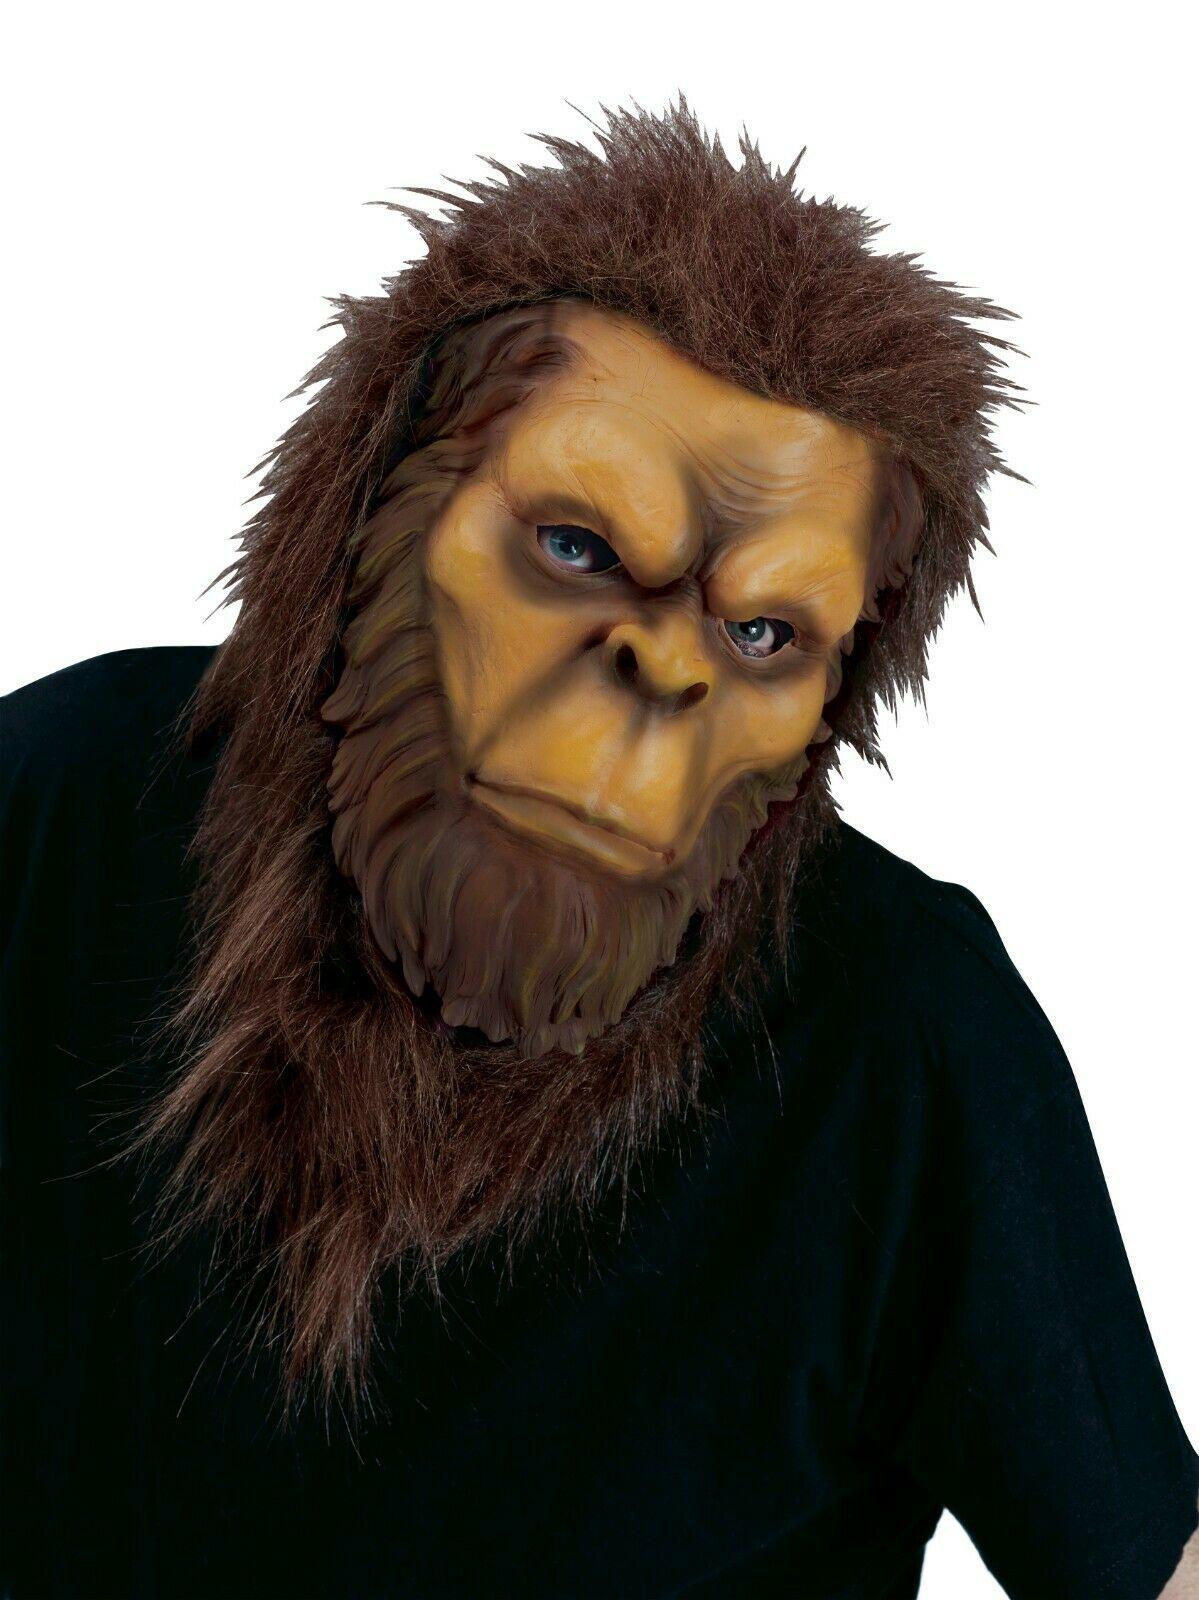 Fun World Big Foot Animal Mask Adult Unisex Halloween Costume Accessory 8546BF